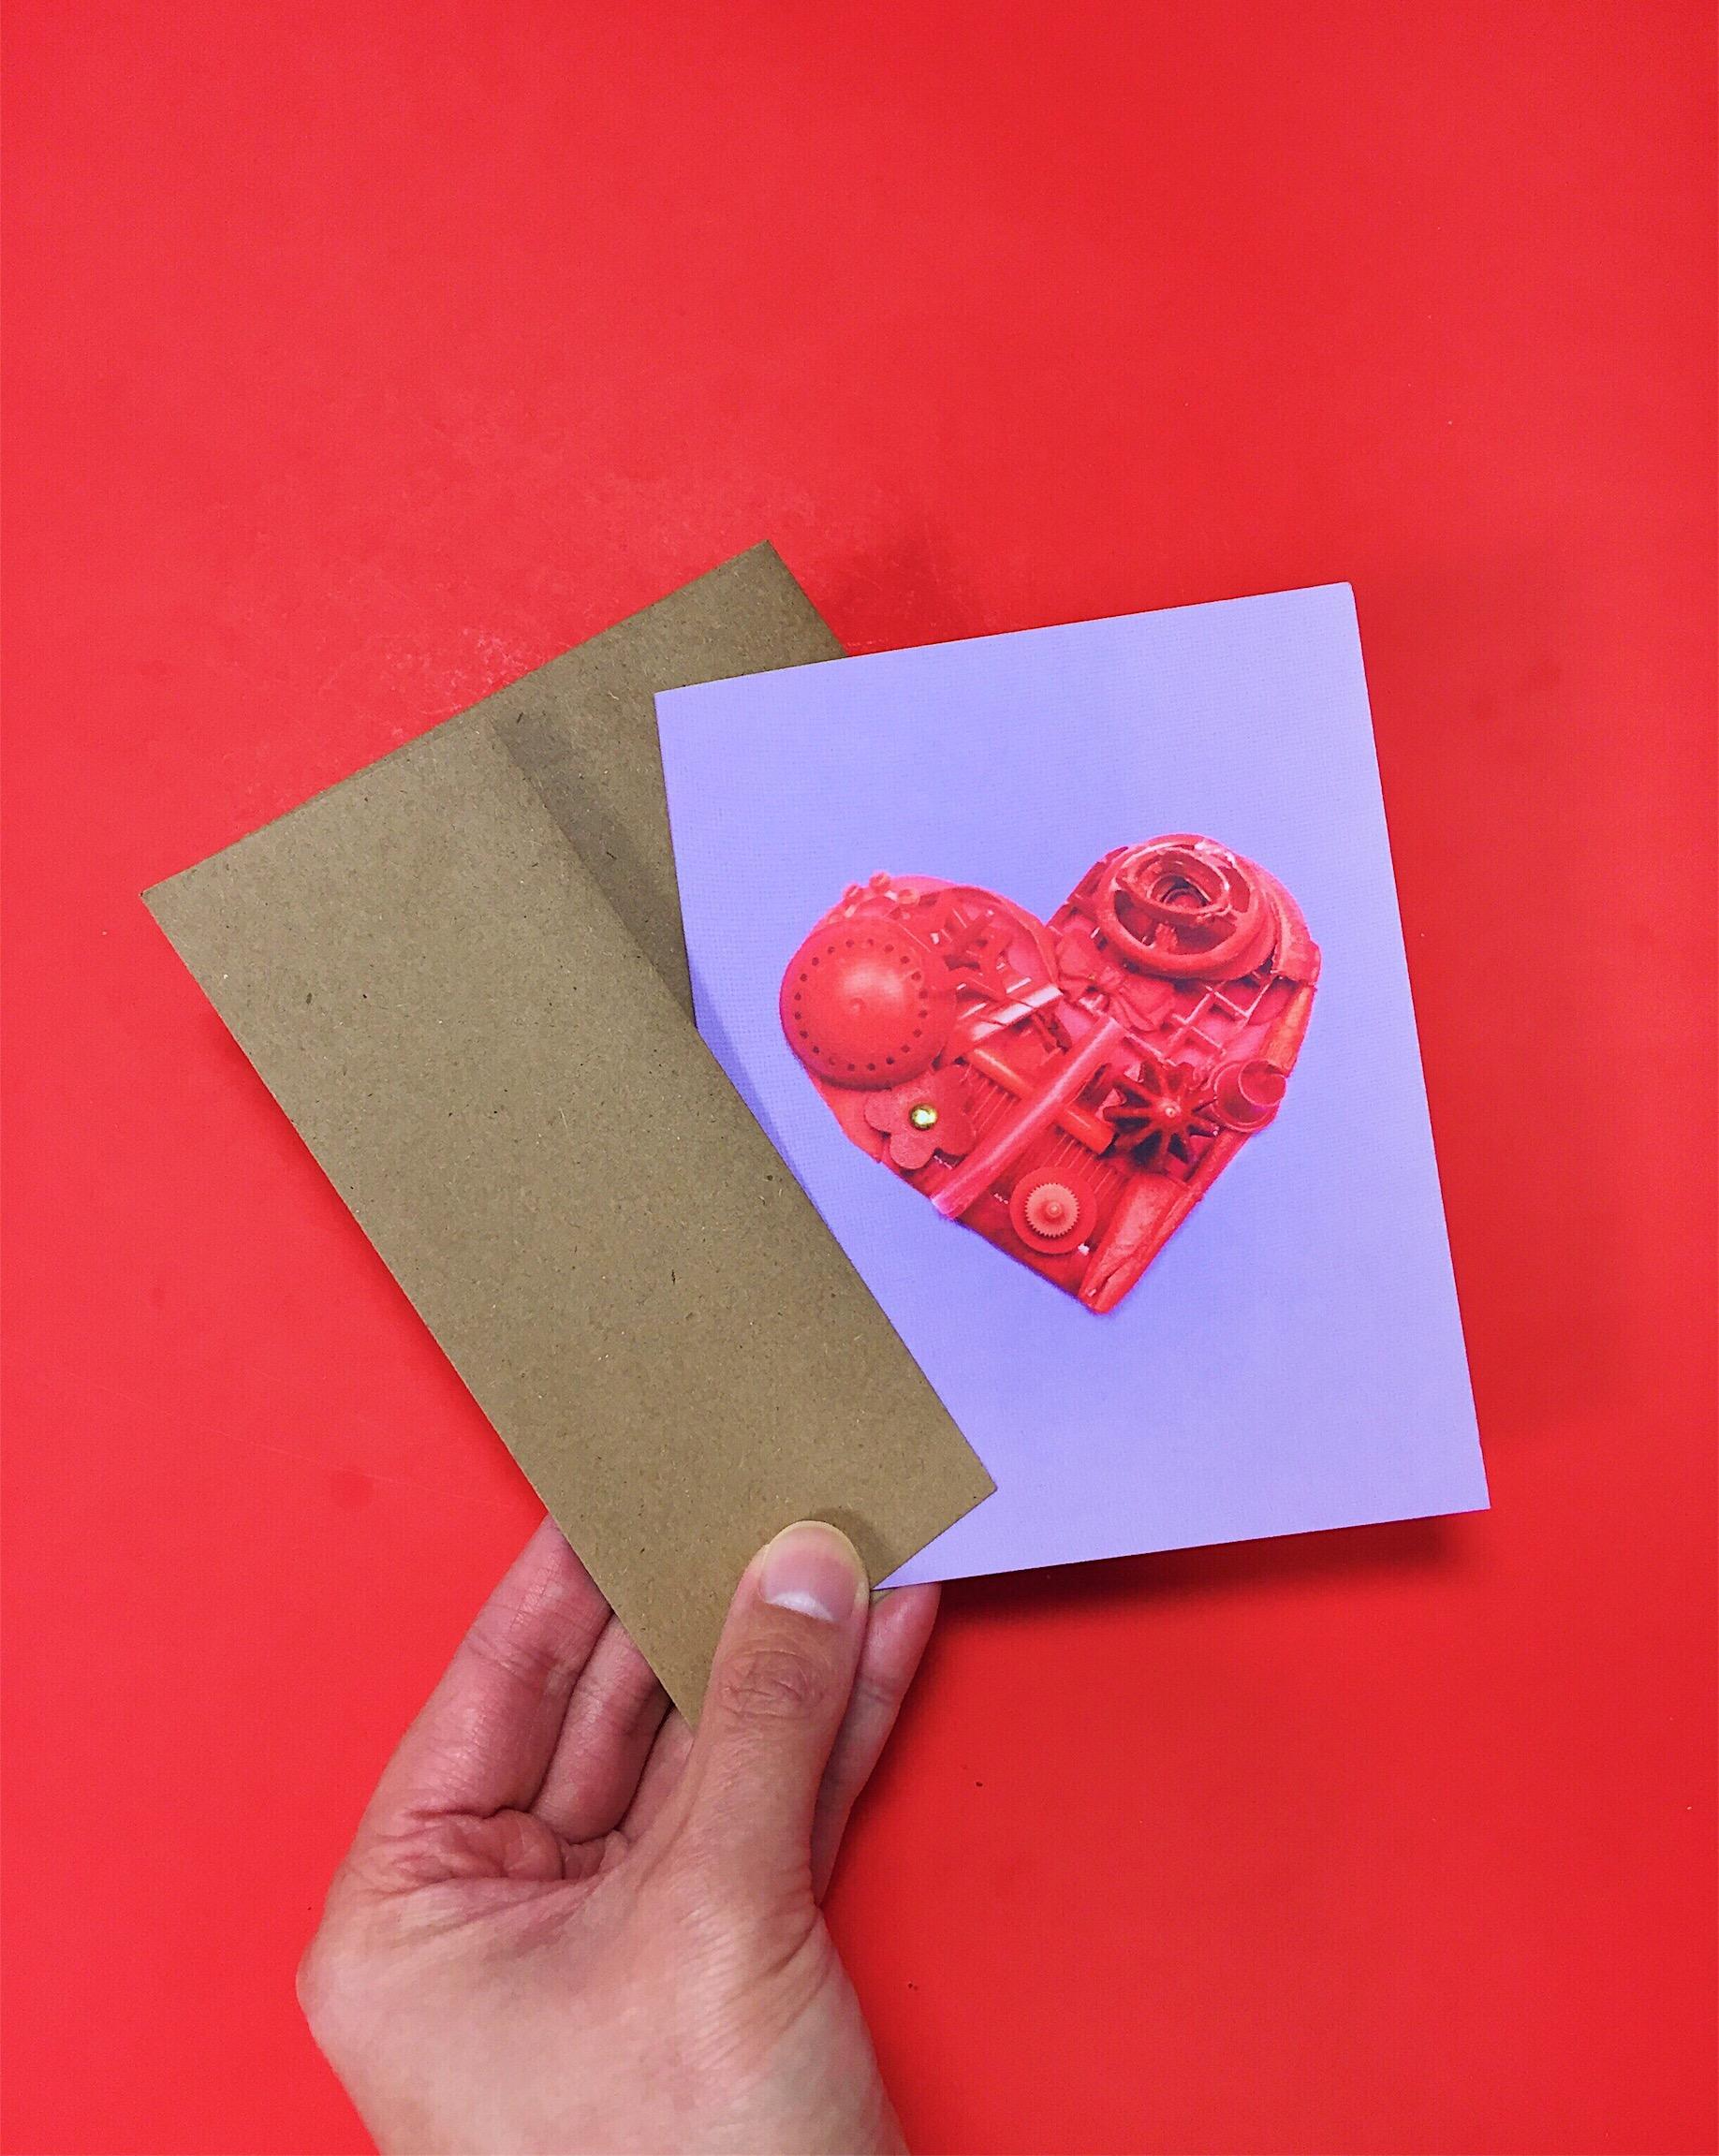 amy_chen_design_beach_plastic_greeting_card_valentine_envelope.jpg